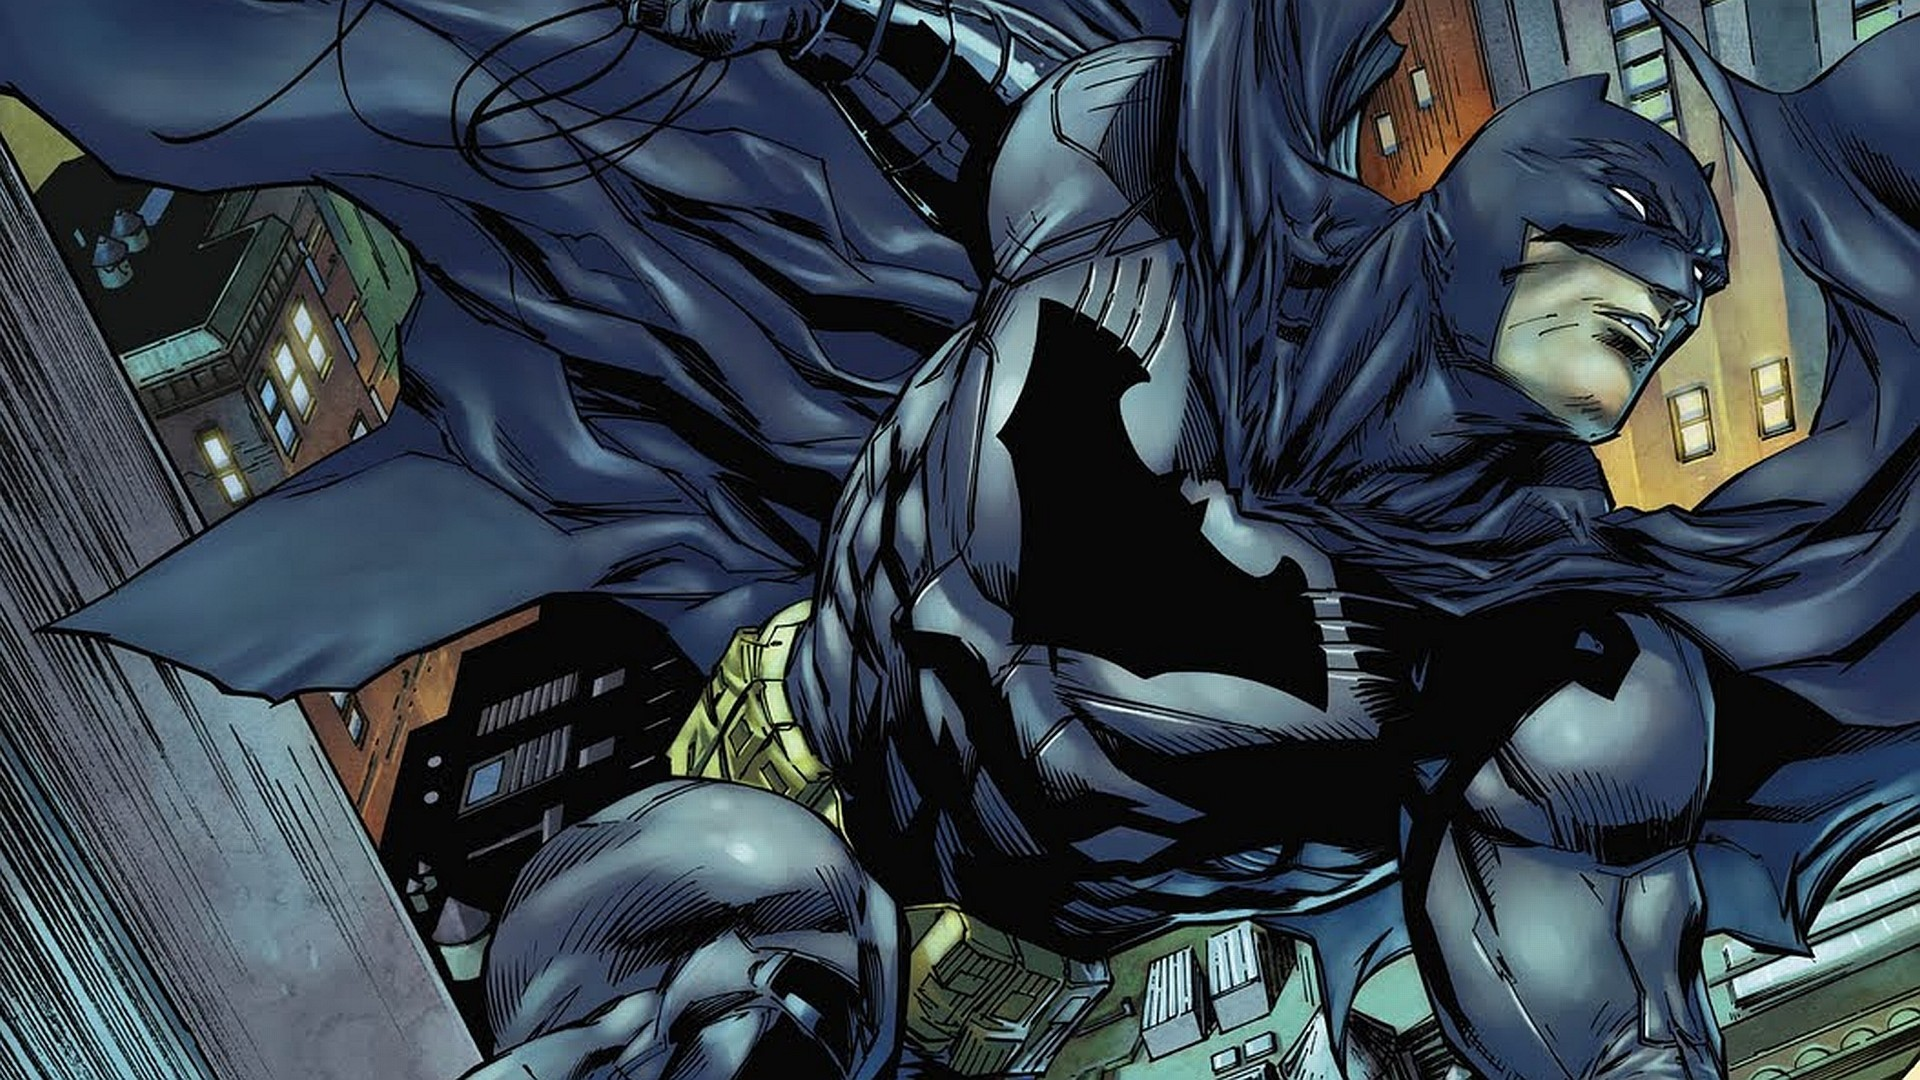 Res: 1920x1080, Batman Comic Wallpaper For Android